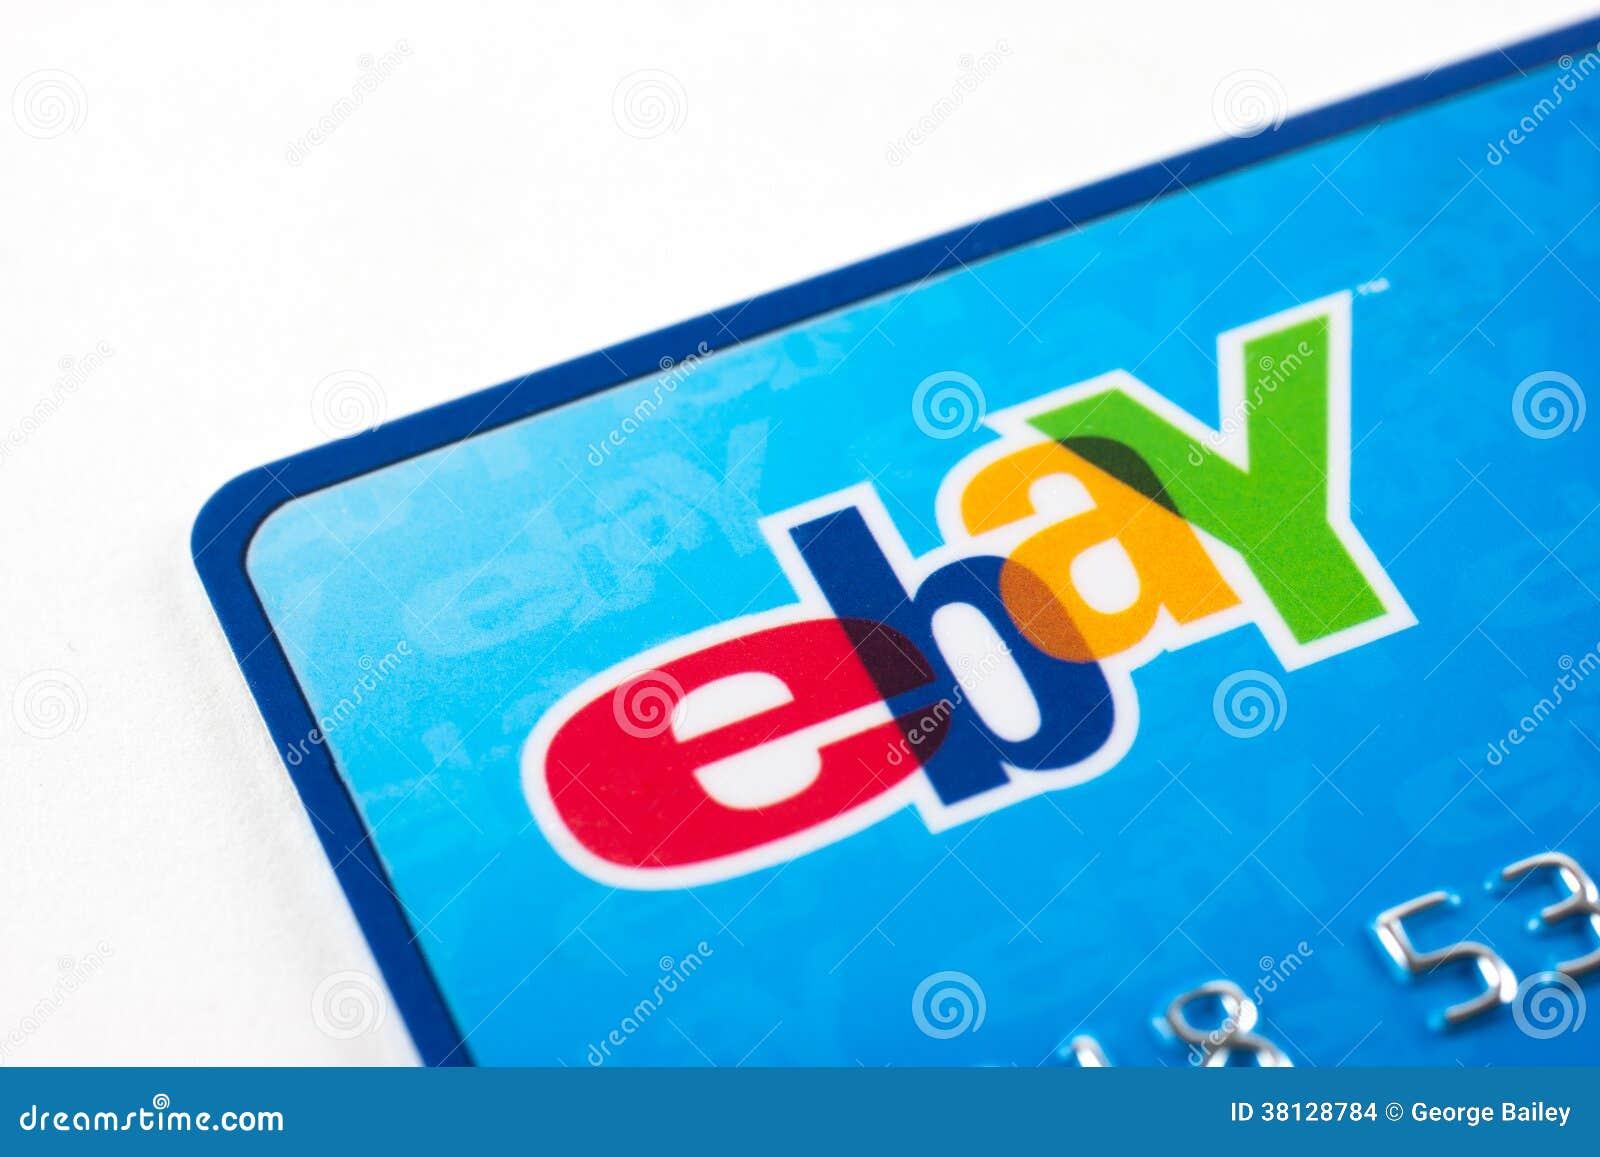 Ebay Credit Card Editorial Stock Image Image Of Plastic 38128784